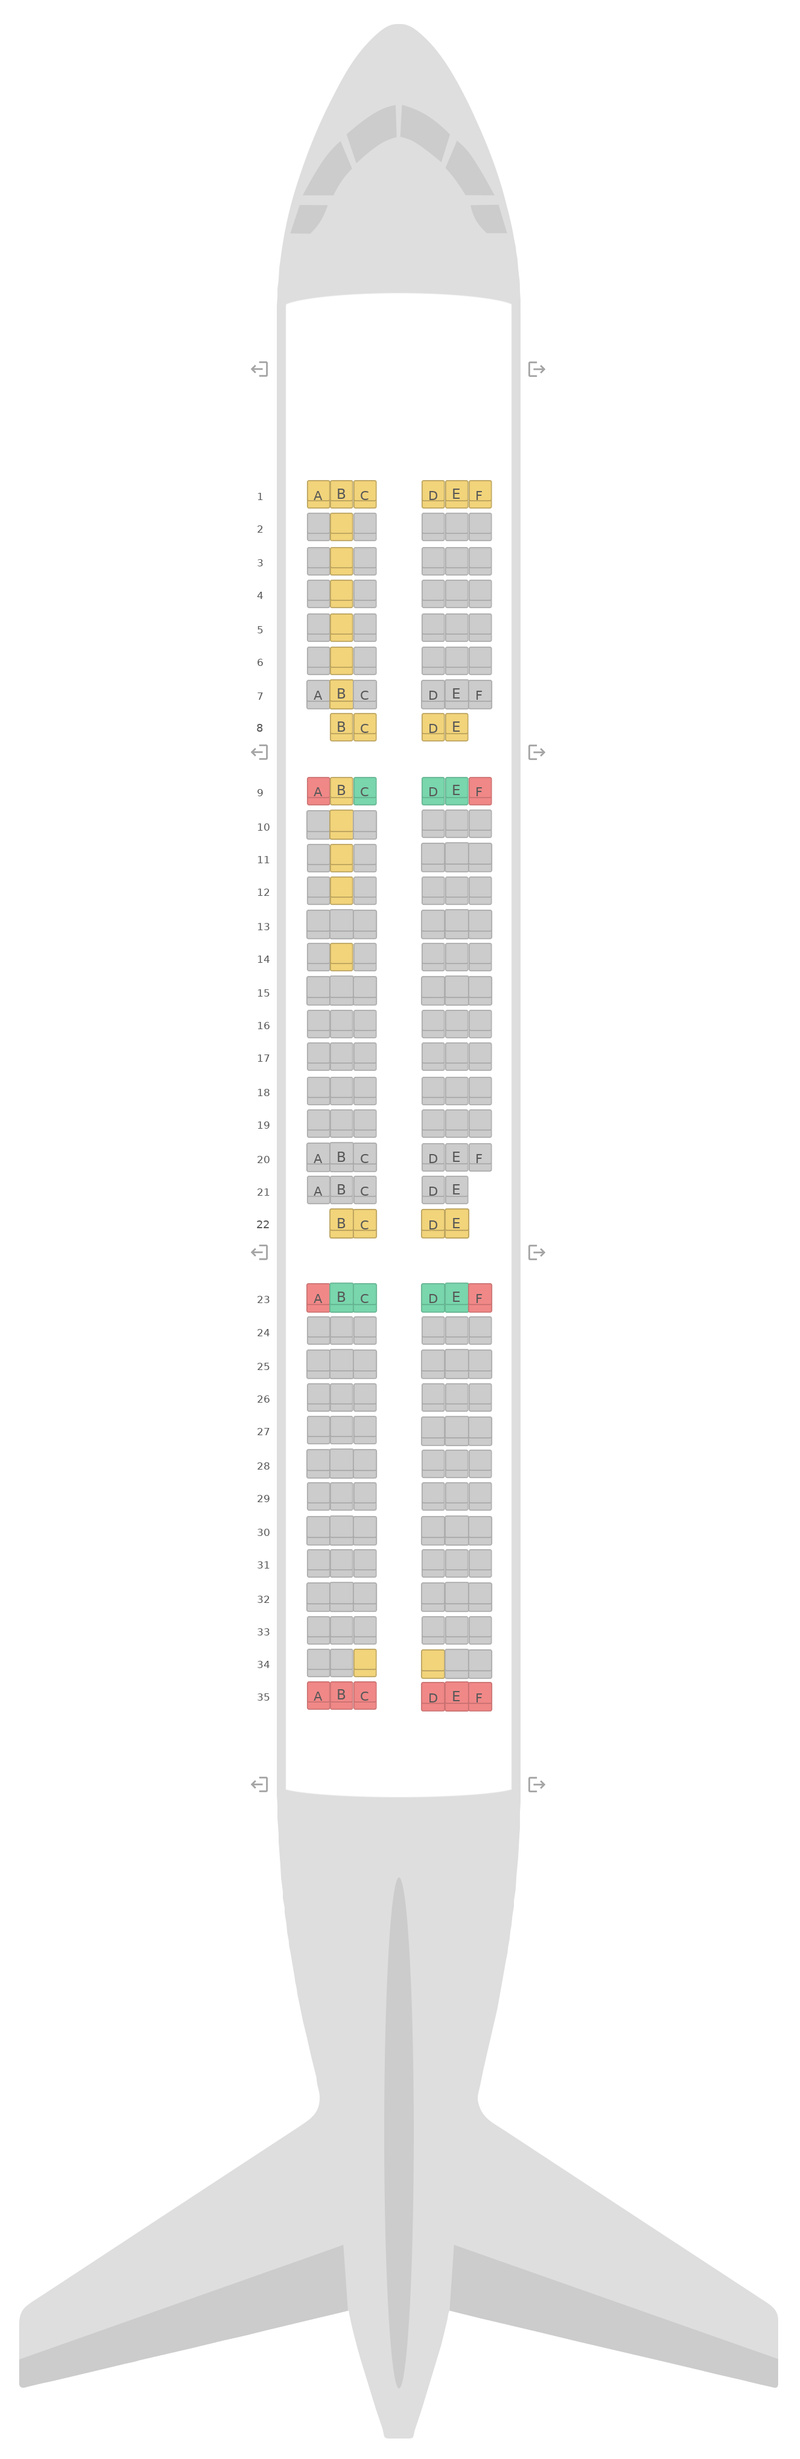 Seat Map British Airways Airbus A321 v3